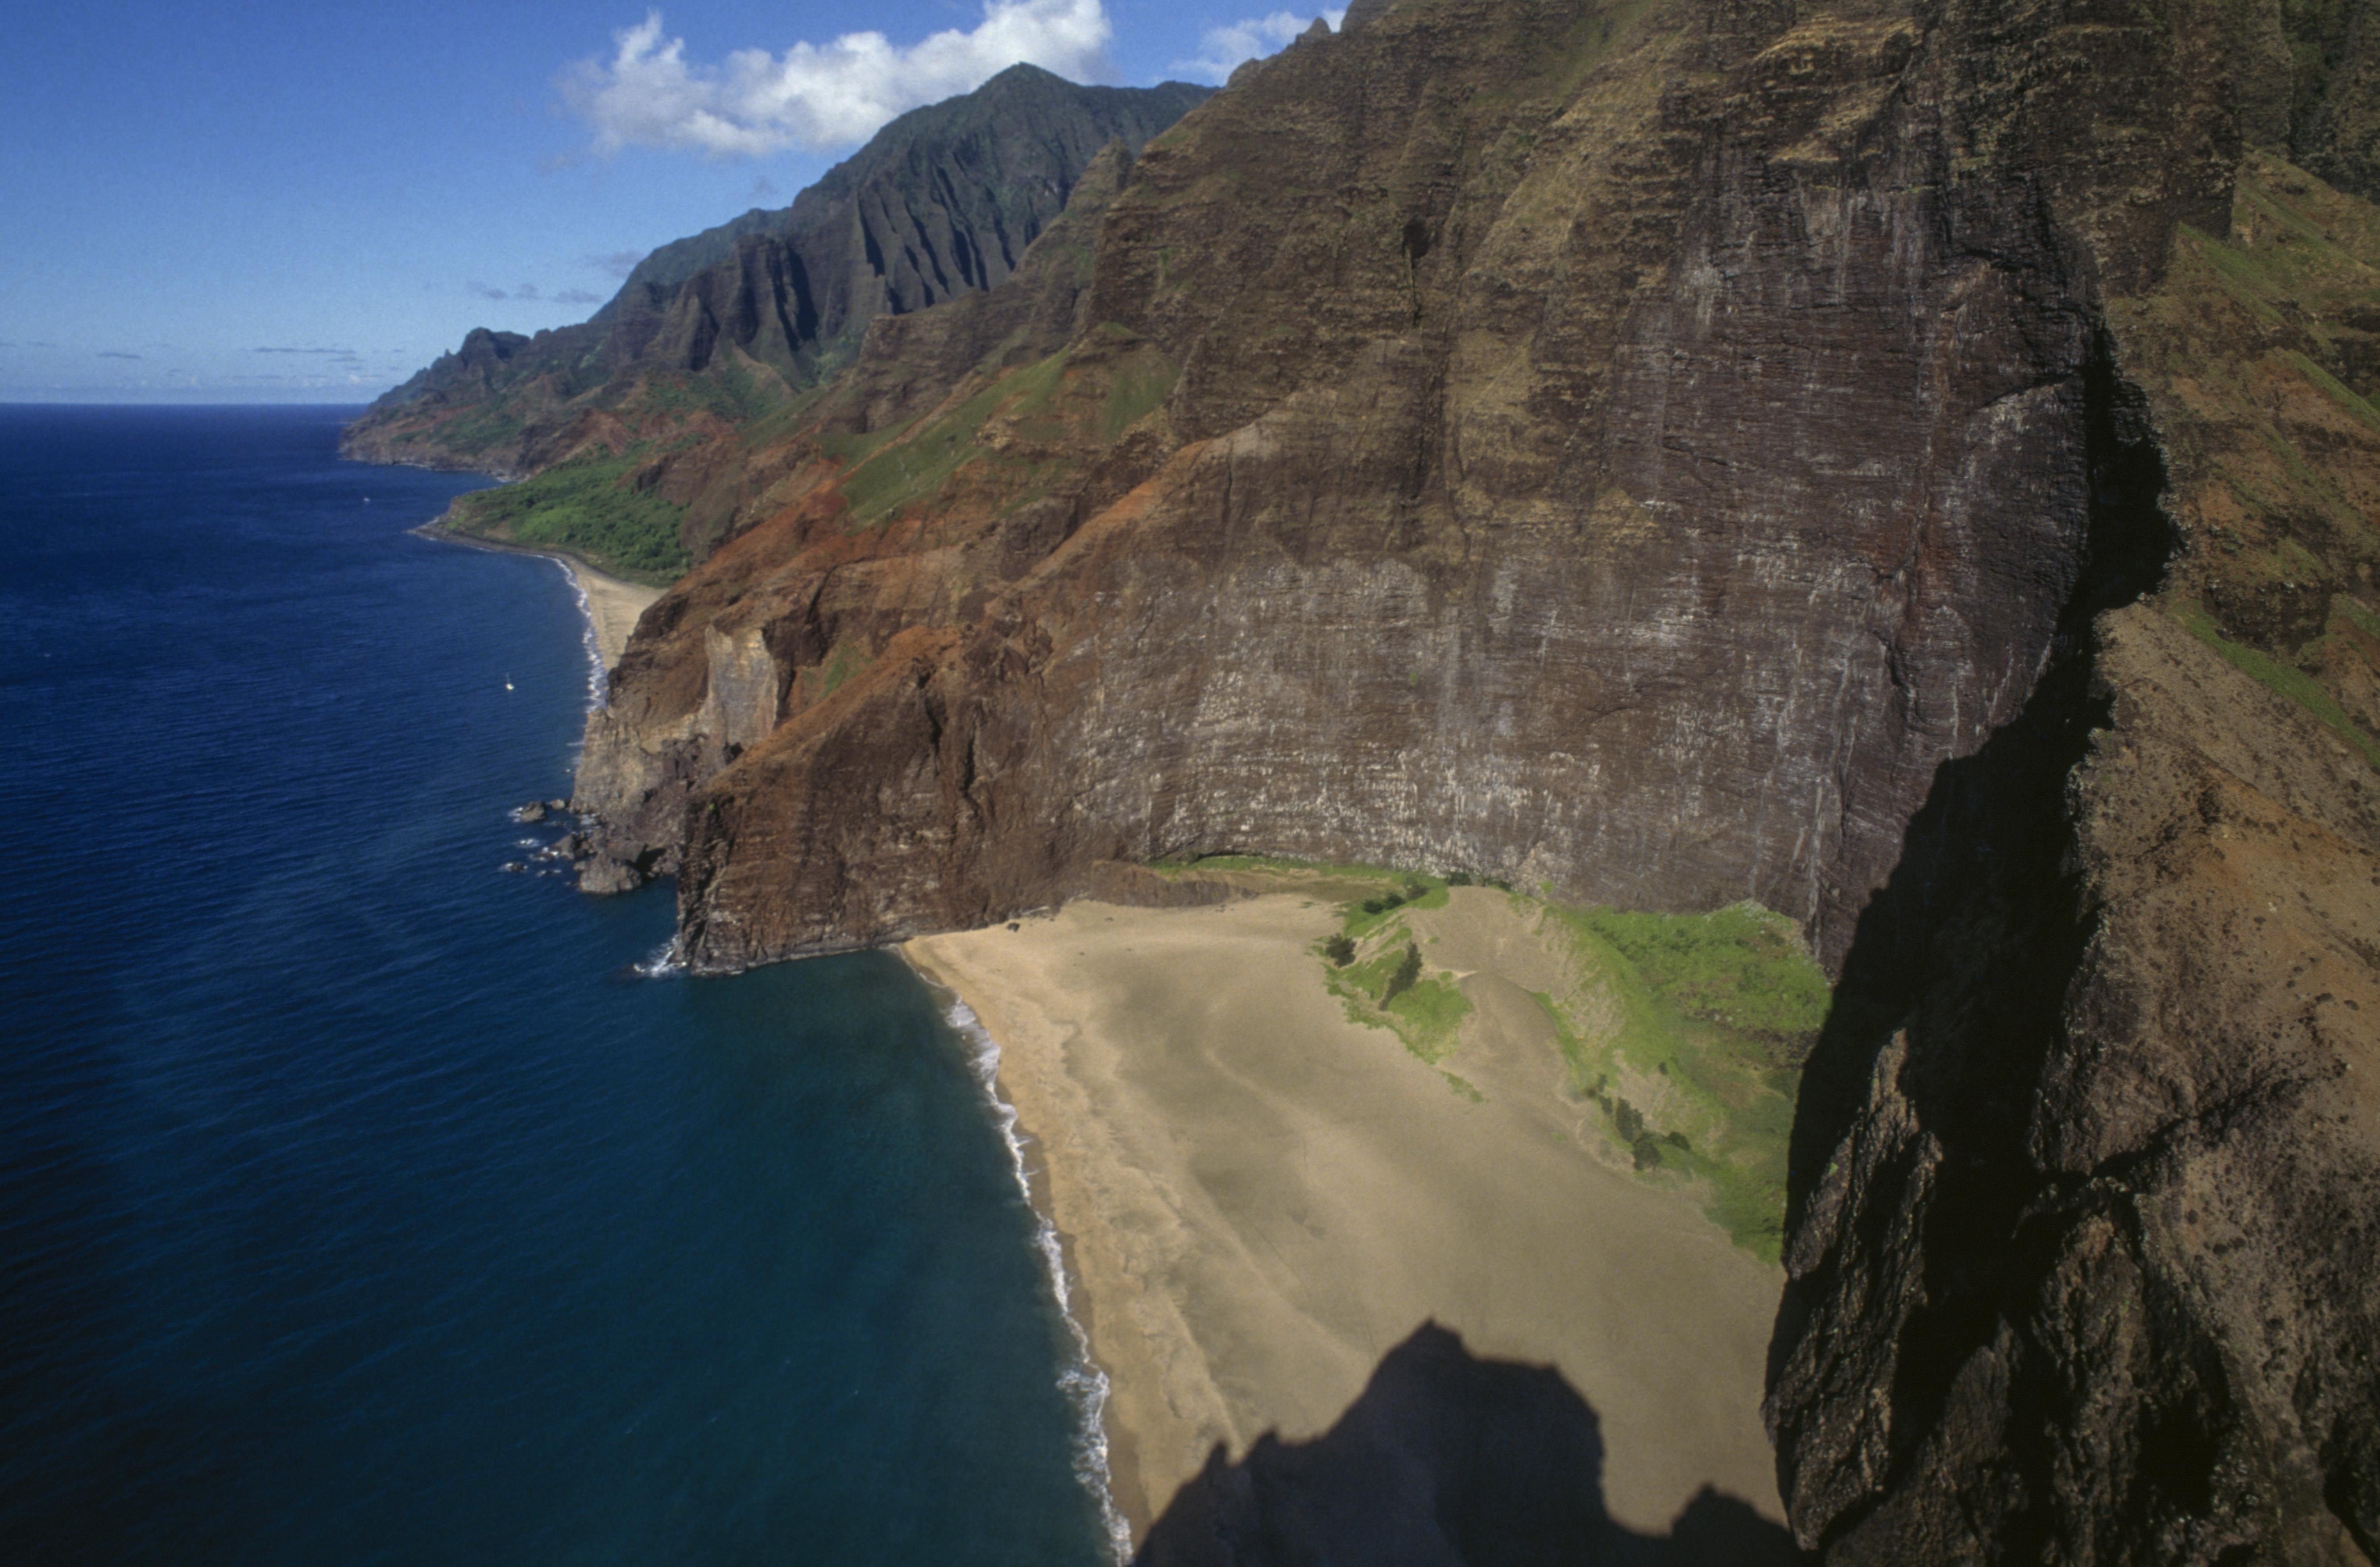 UNITED STATES - APRIL 23: Beach, Na Pali Coast Park, island of Kauai, Hawai, United States of America. (Photo by DeAgostini/Getty Images)